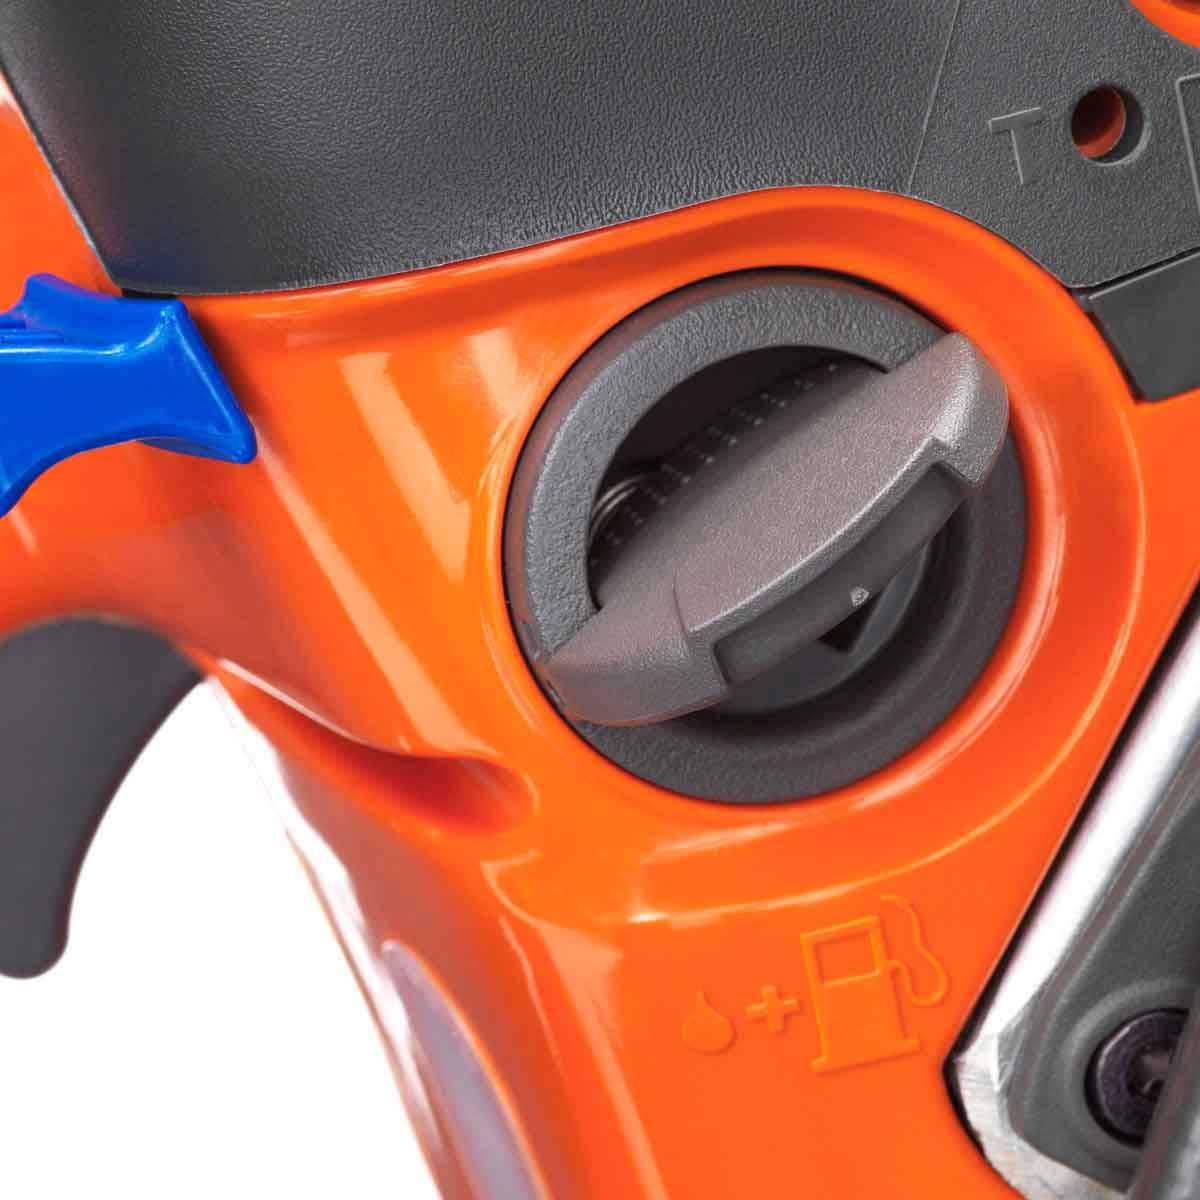 two-stroke gas saw